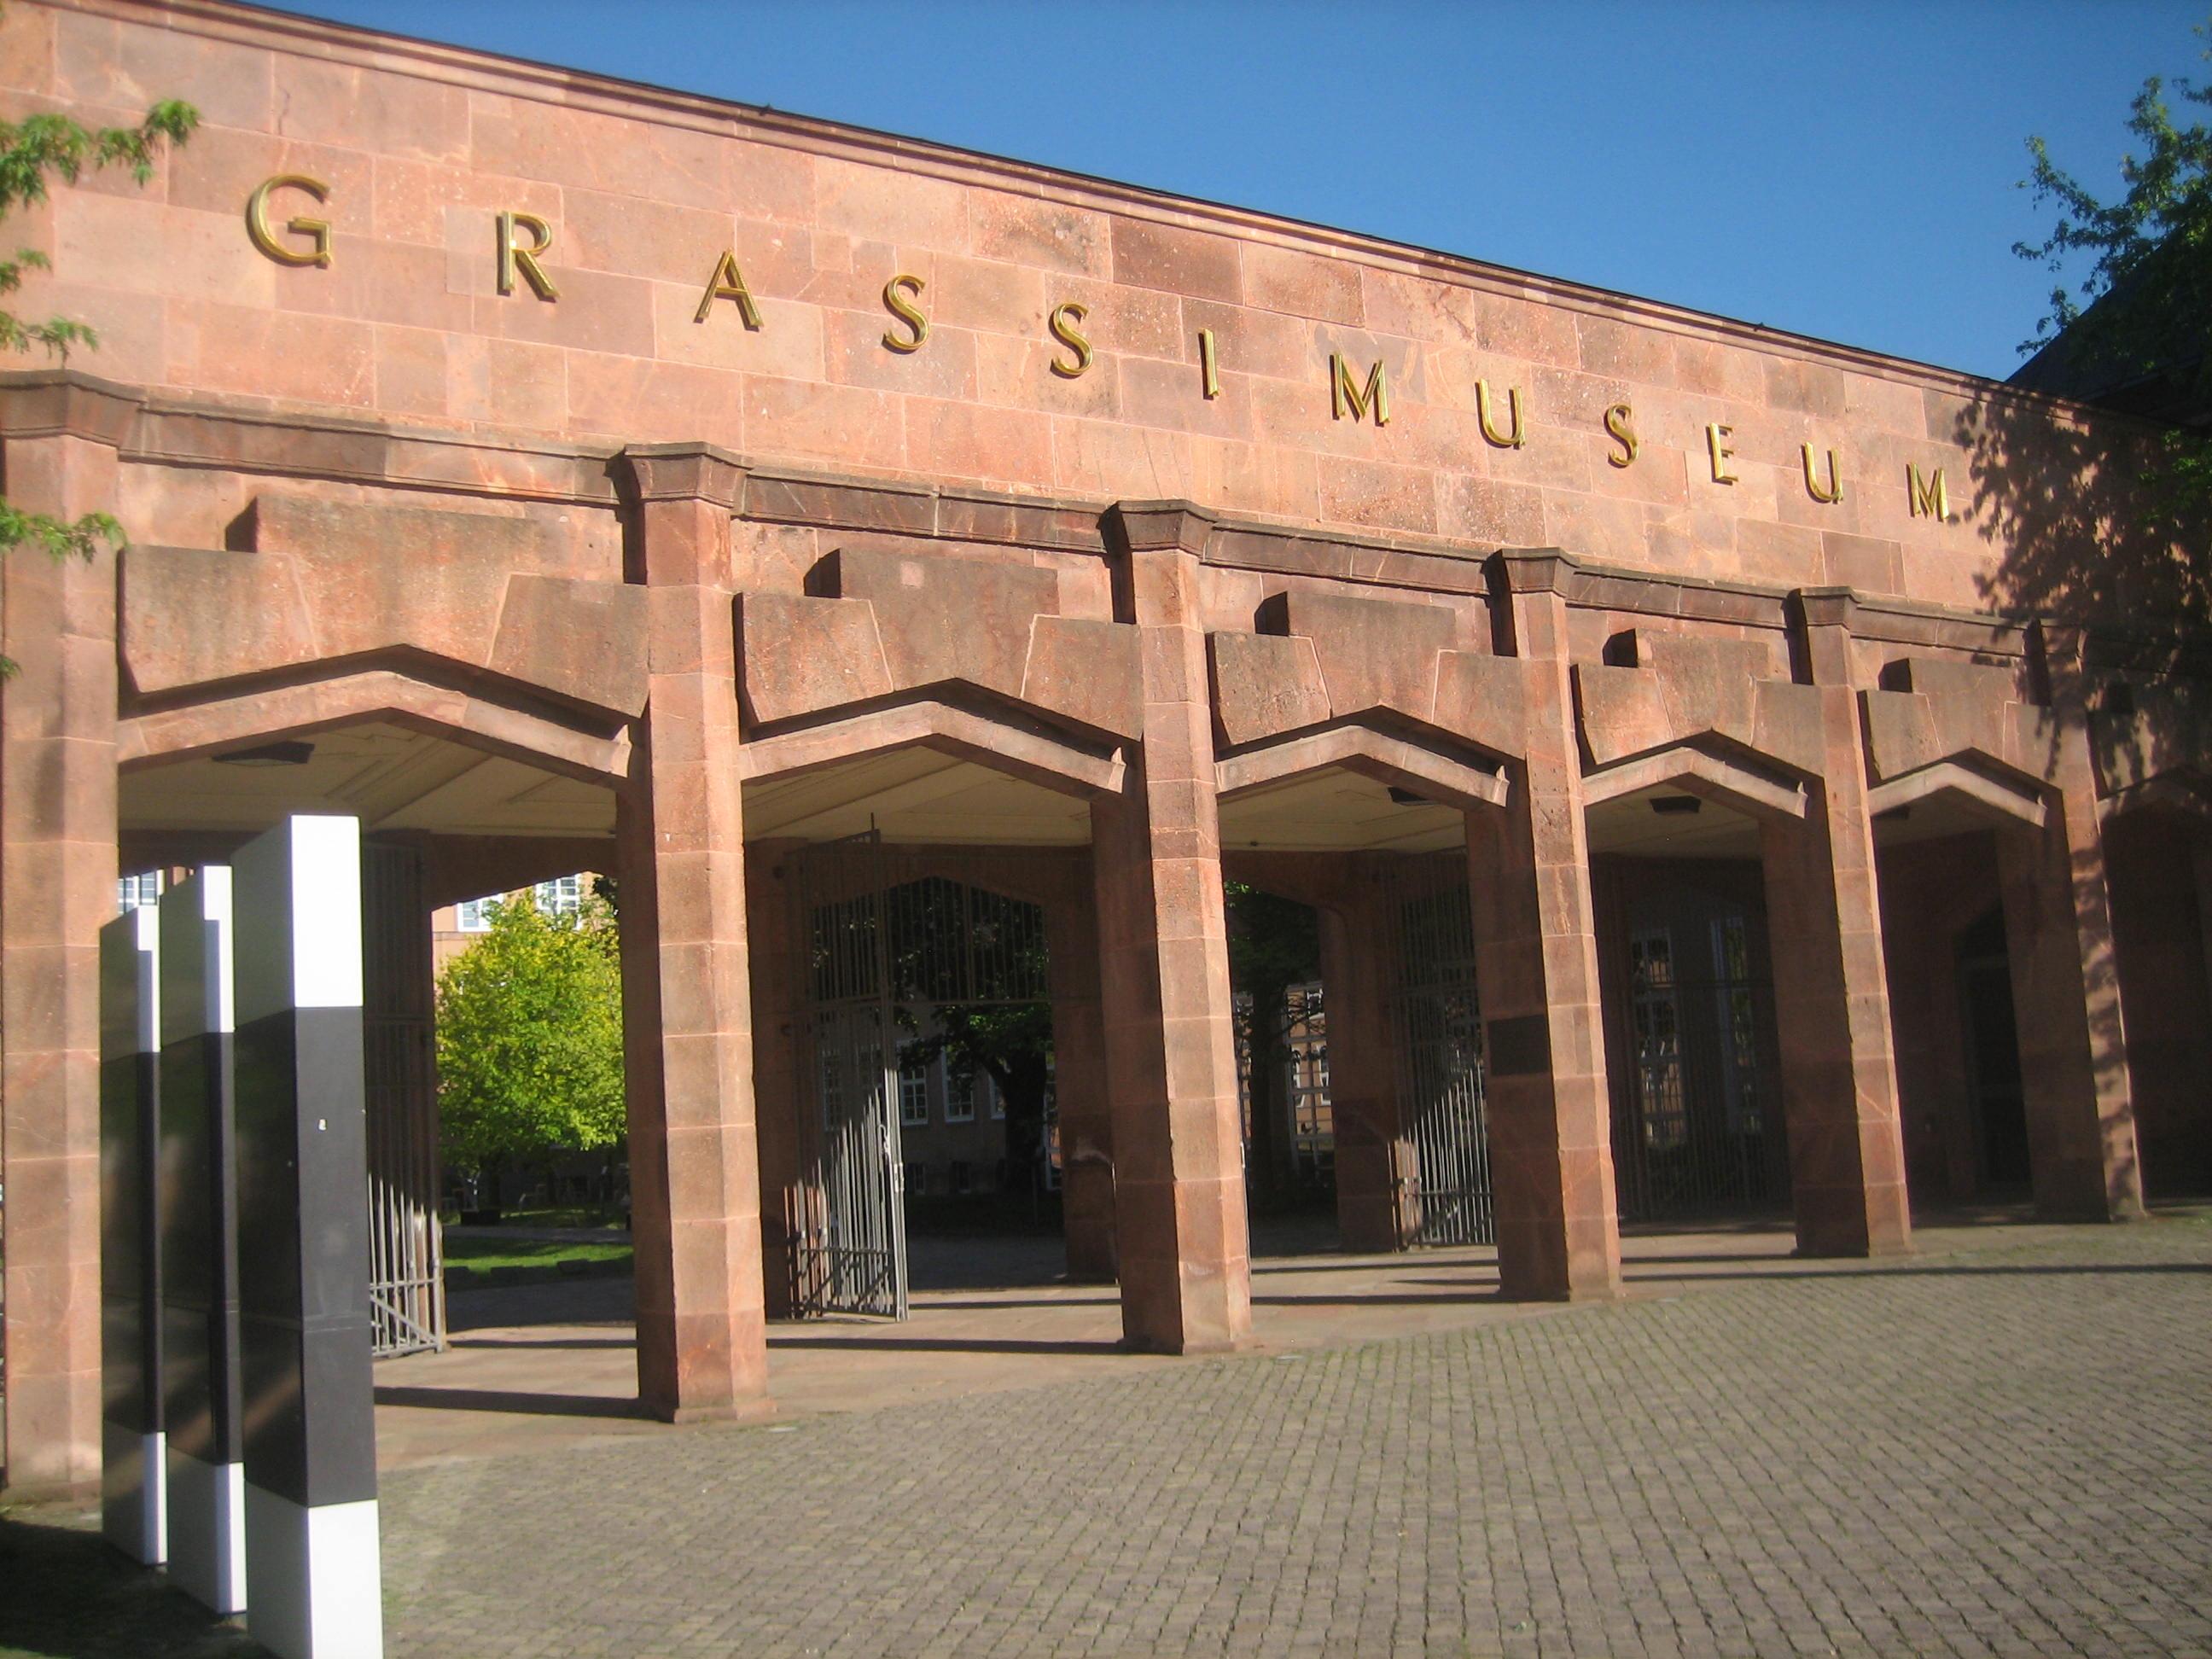 Grassimuseum, mei 2018. Foto Esther Doornbusch, CC BY 4.0